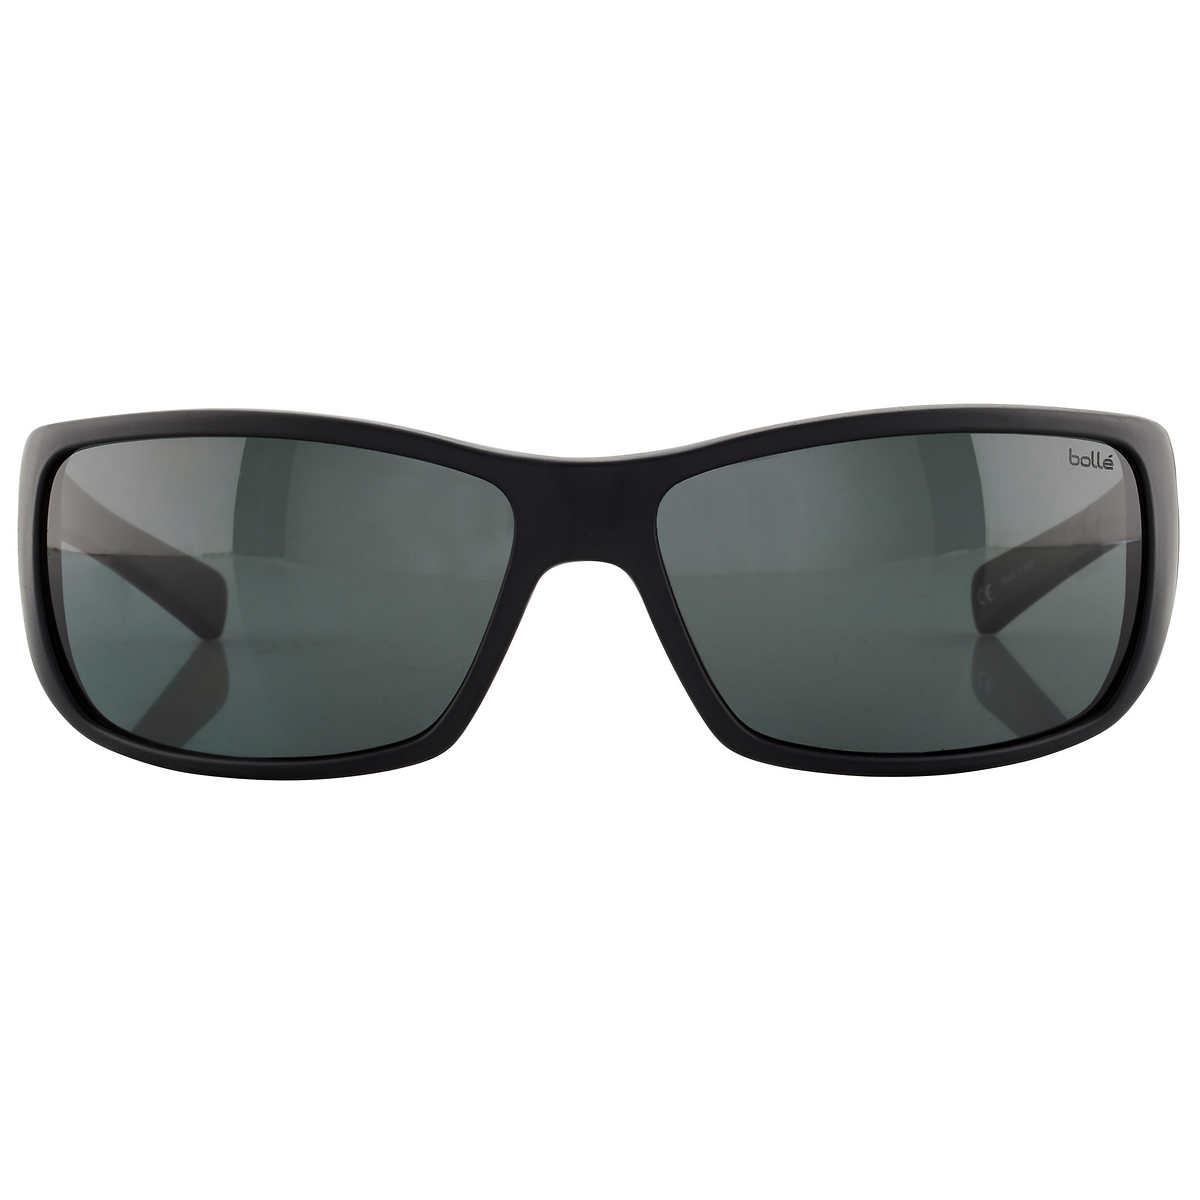 1226be2616e3 Bollé Trivia Polarized Sunglasses